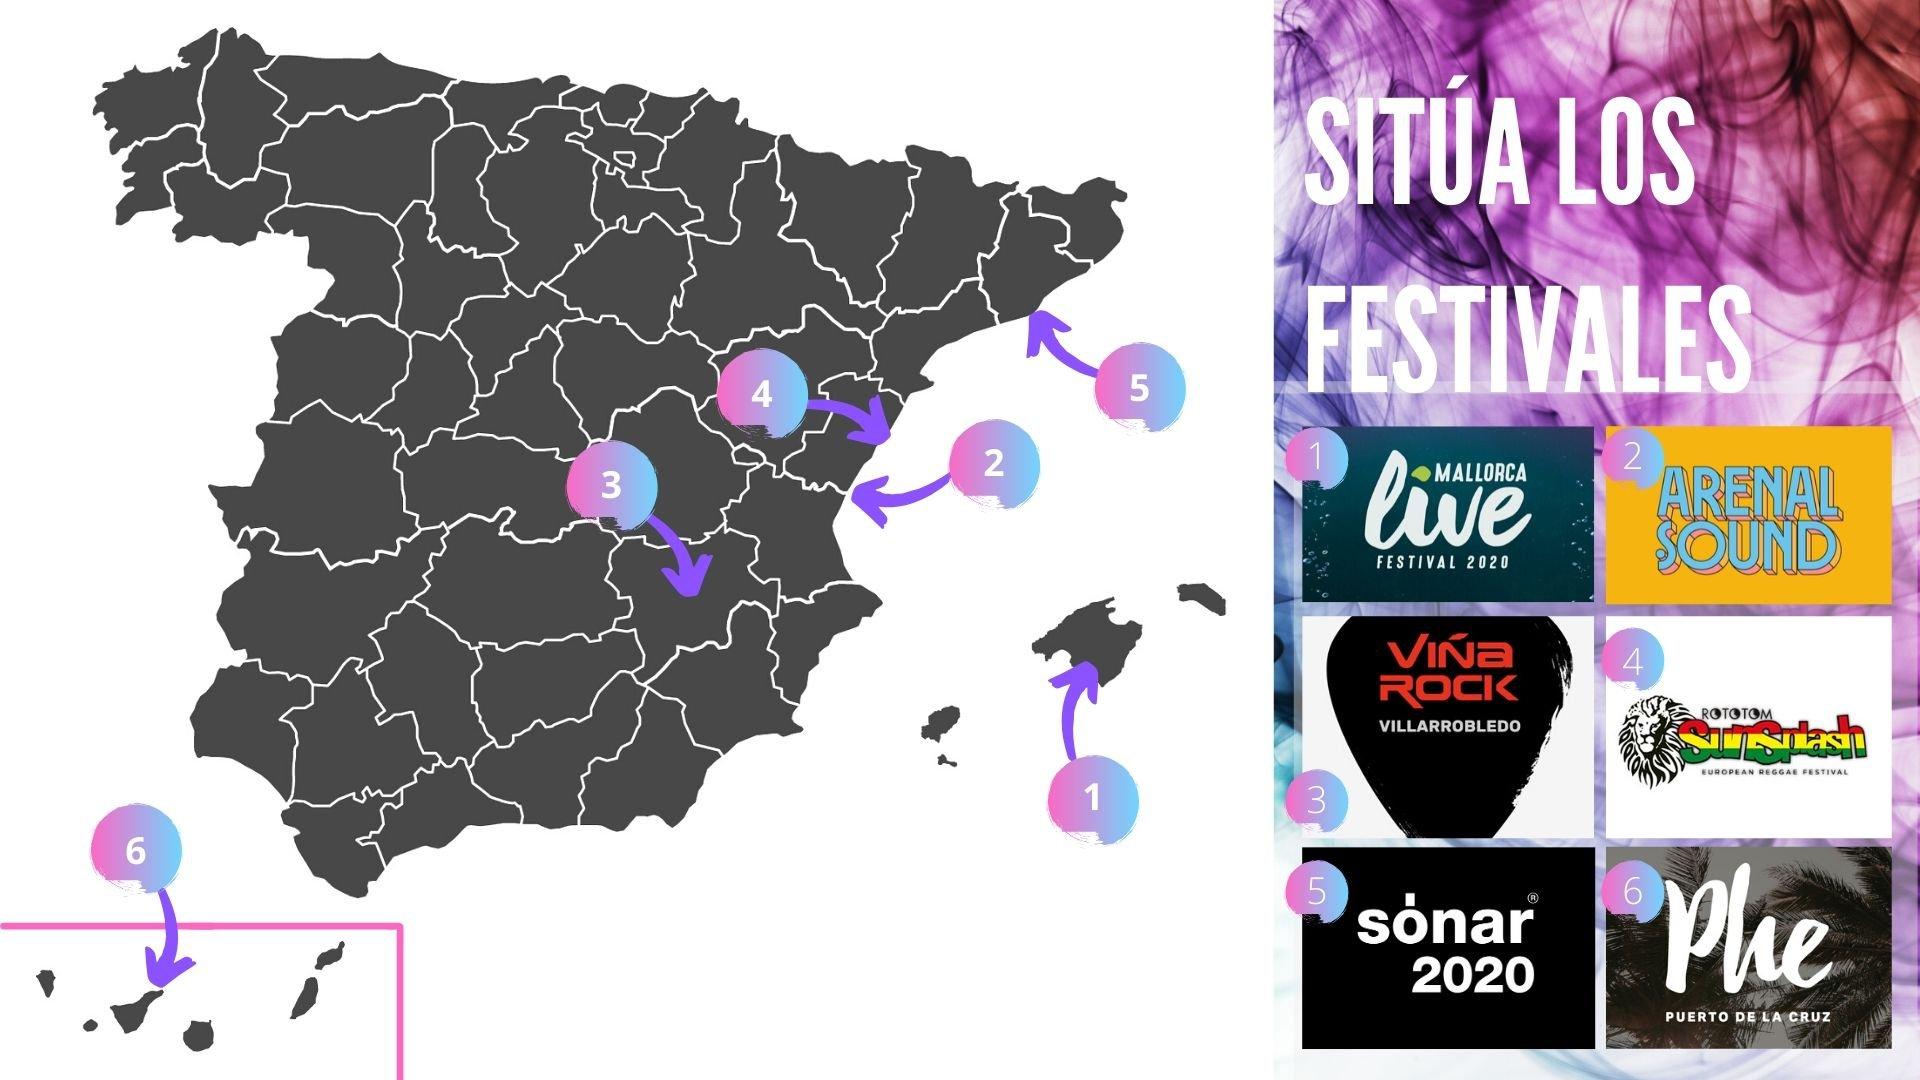 Mapa de festivales en España / freepik.com